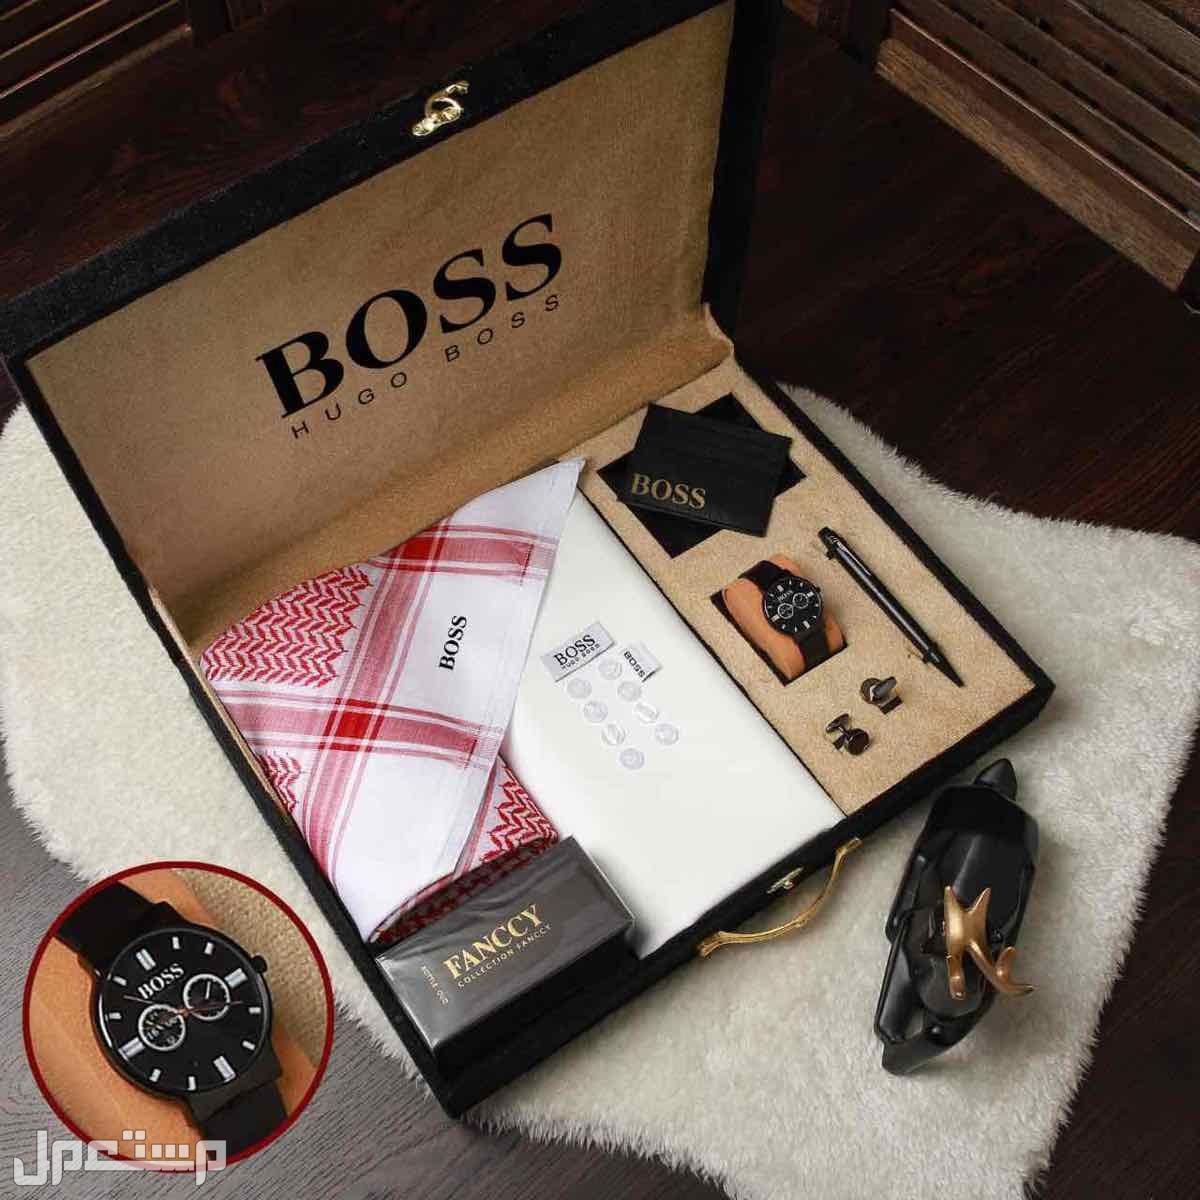 بوكس هدايا رجالي فخمه بوس مونت بلانك جفنشي قماش شماغ ساعه قلم كبك صندل مبخر